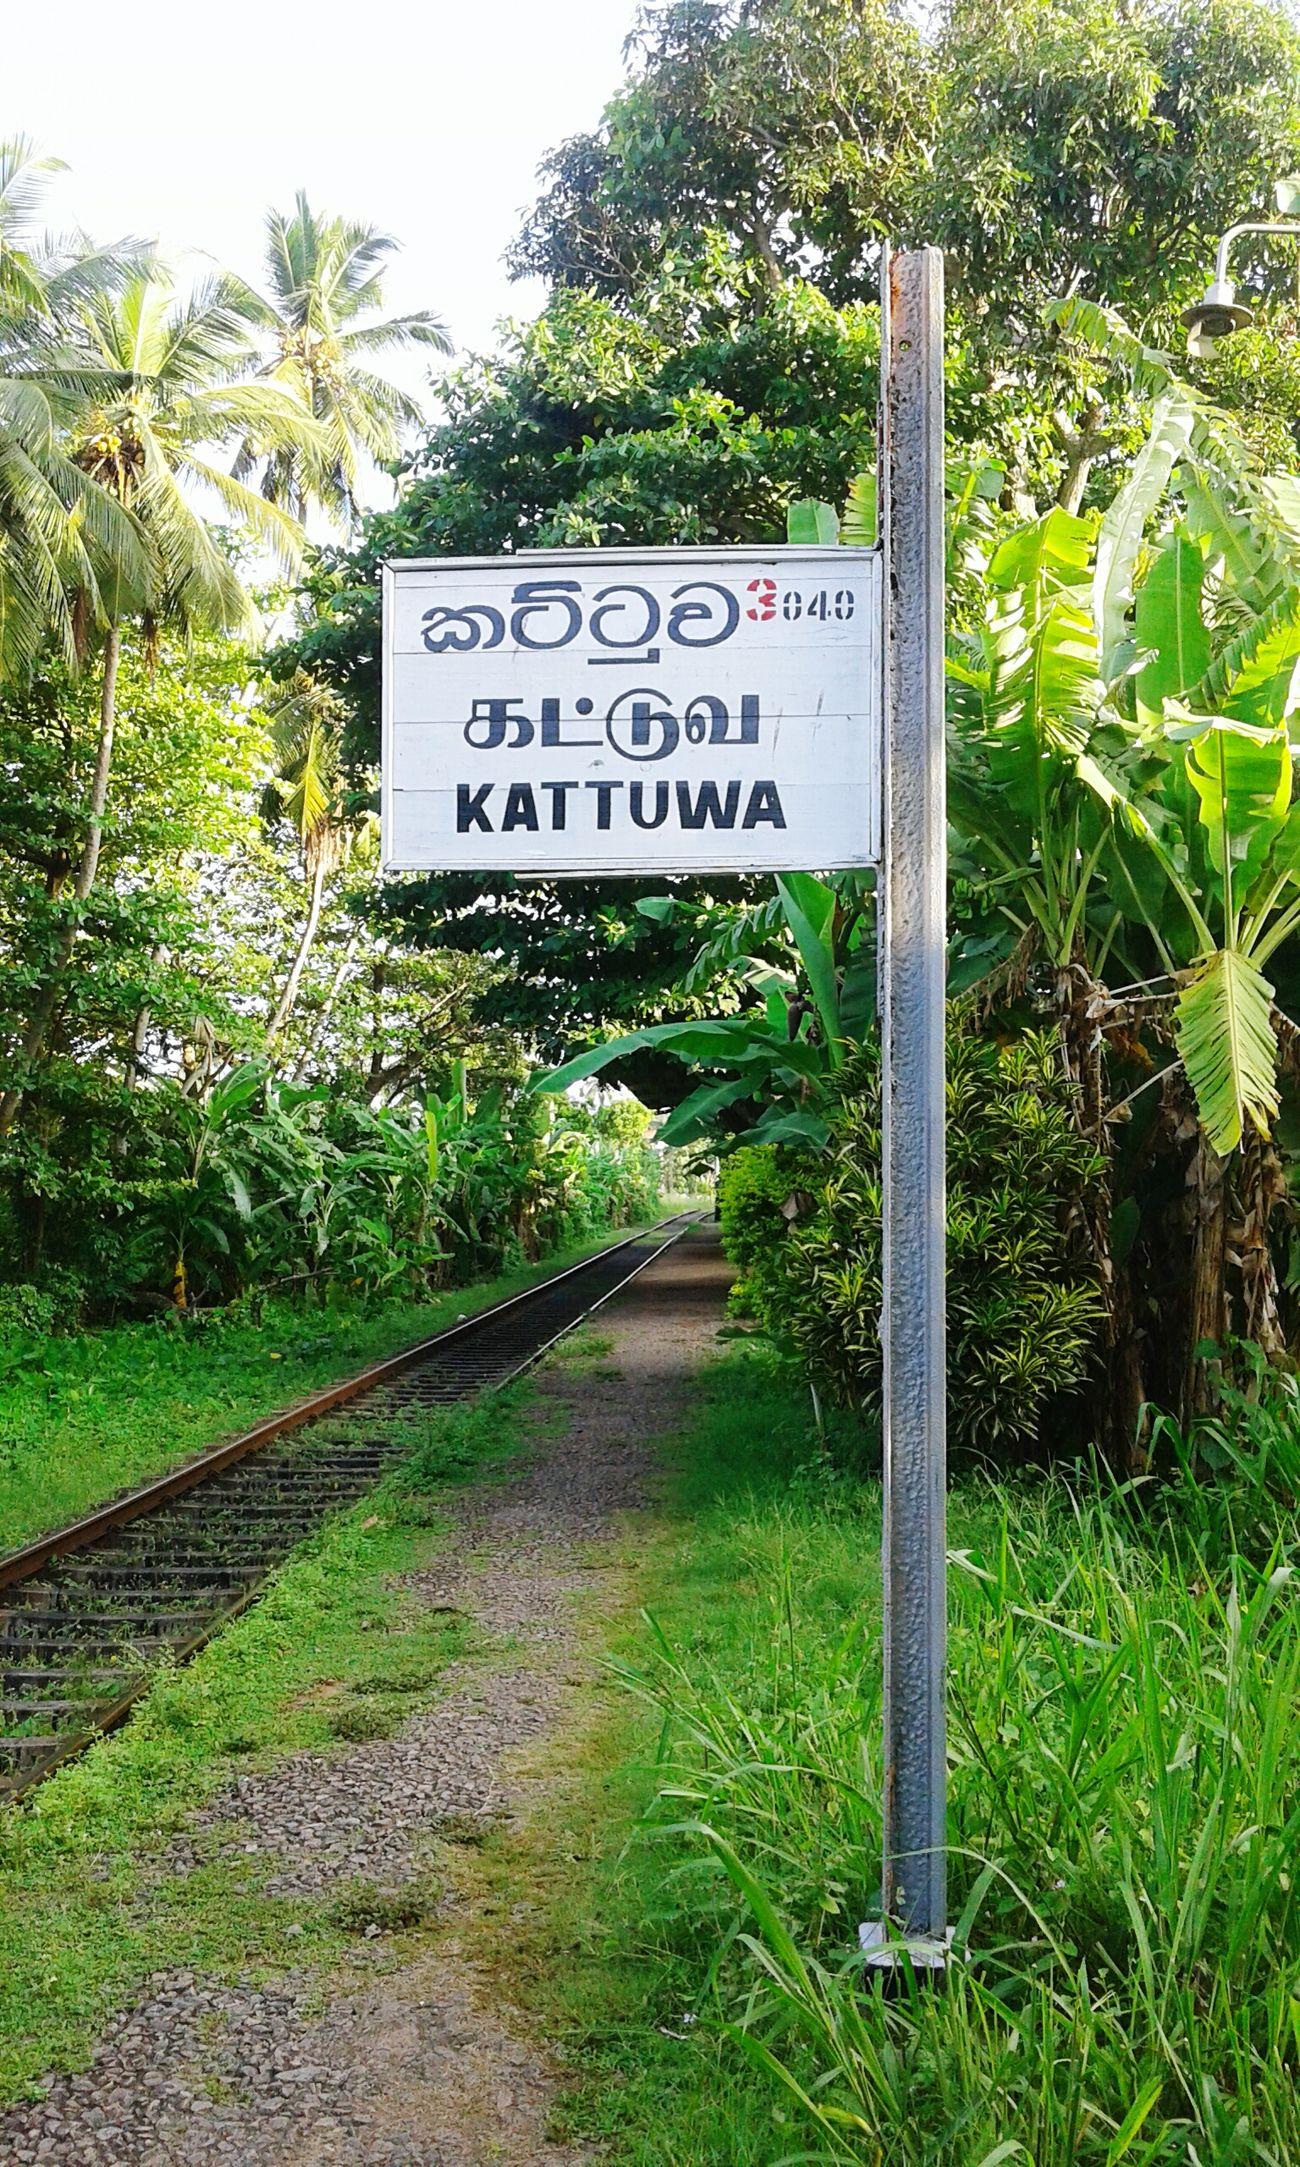 railway sri lanka...